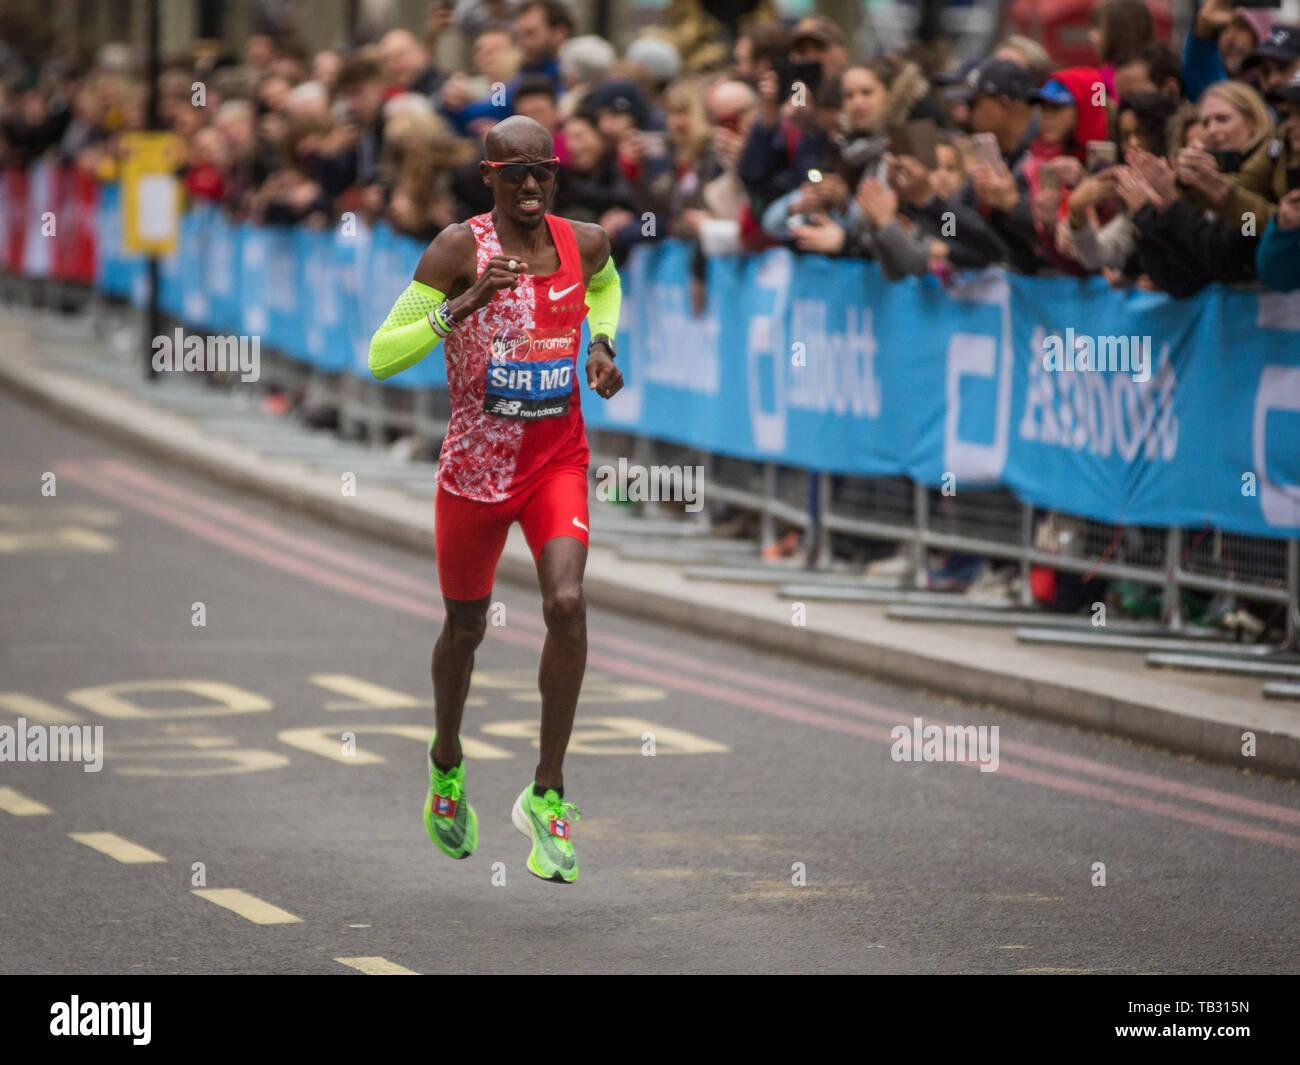 Sir Mo Farah running in the 2019 Virgin Money London Marathon passing along the Embankment towards the finish line on the Mall.  Featuring: Sir Mo Farah Where: London, United Kingdom When: 28 Apr 2019 Credit: Wheatley/WENN - Stock Image